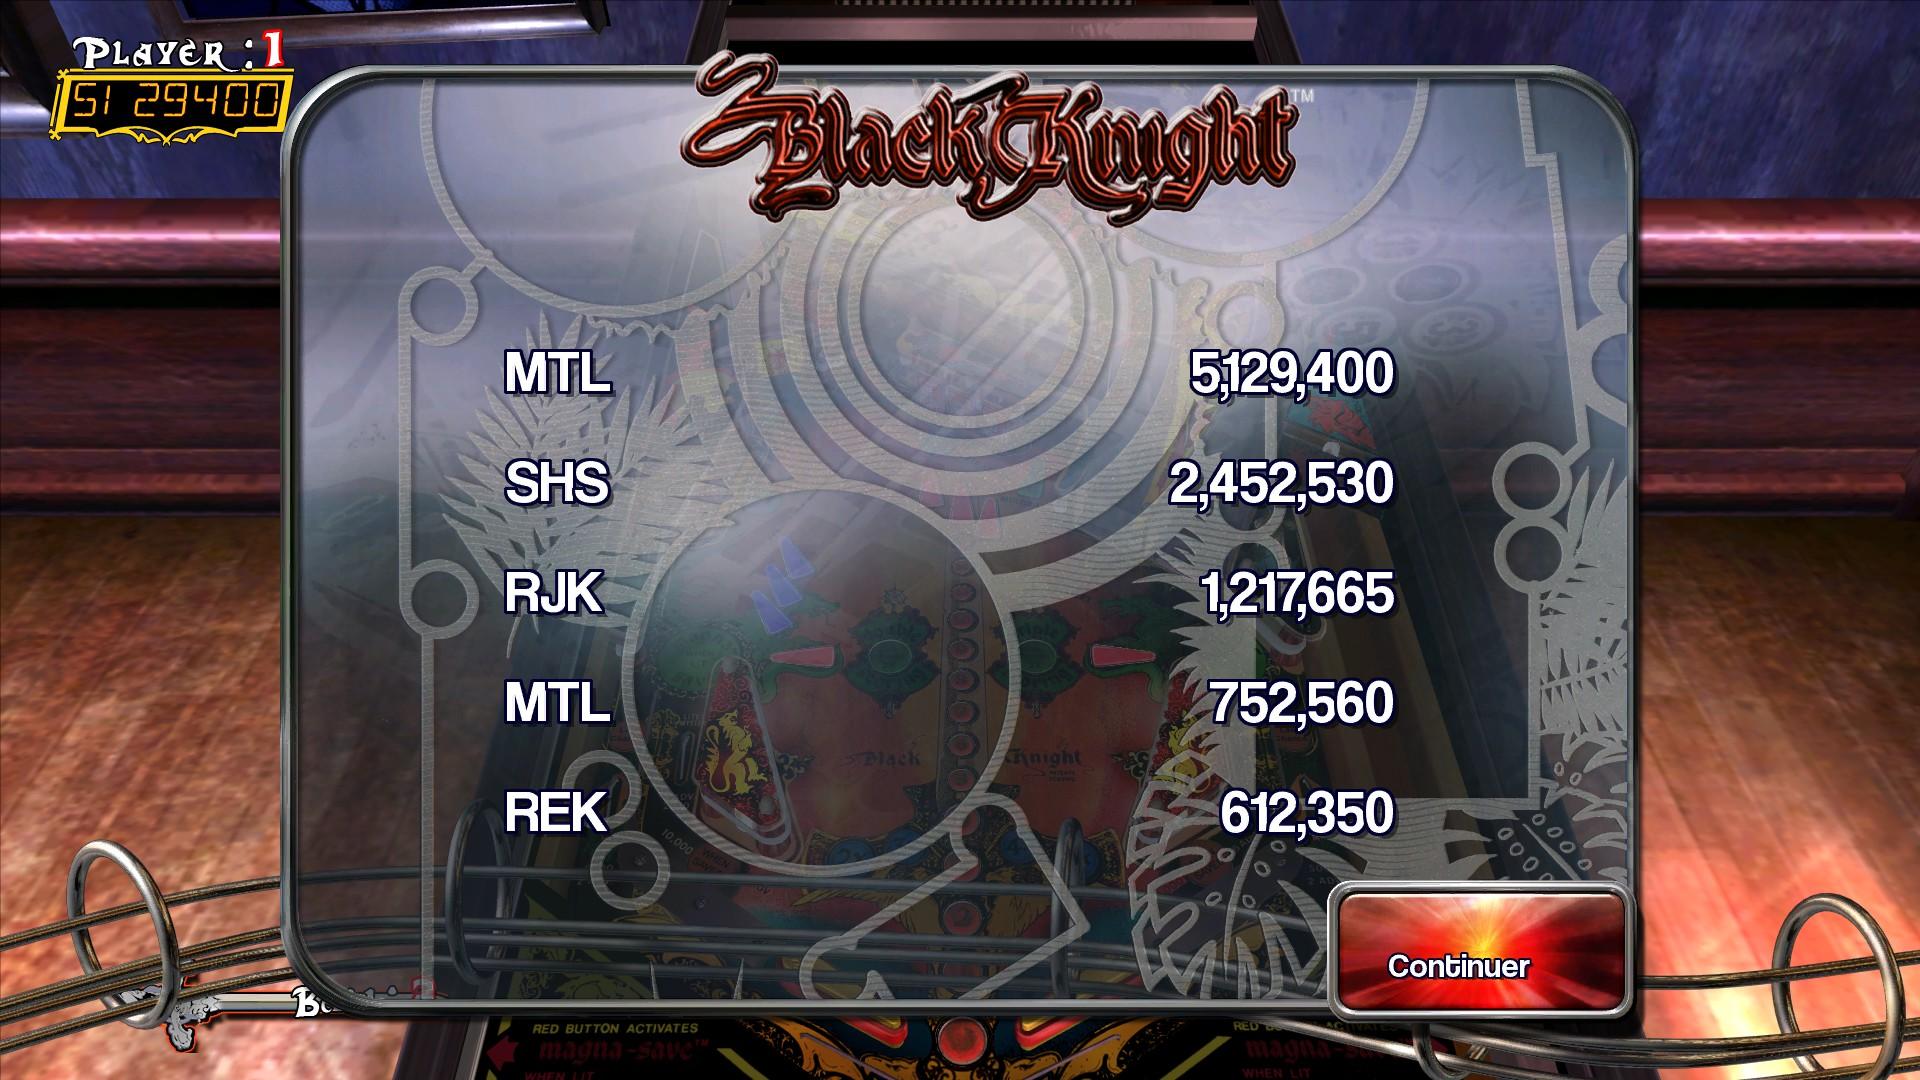 Mantalow: Pinball Arcade: Black Knight (PC) 5,129,400 points on 2016-02-24 08:04:58